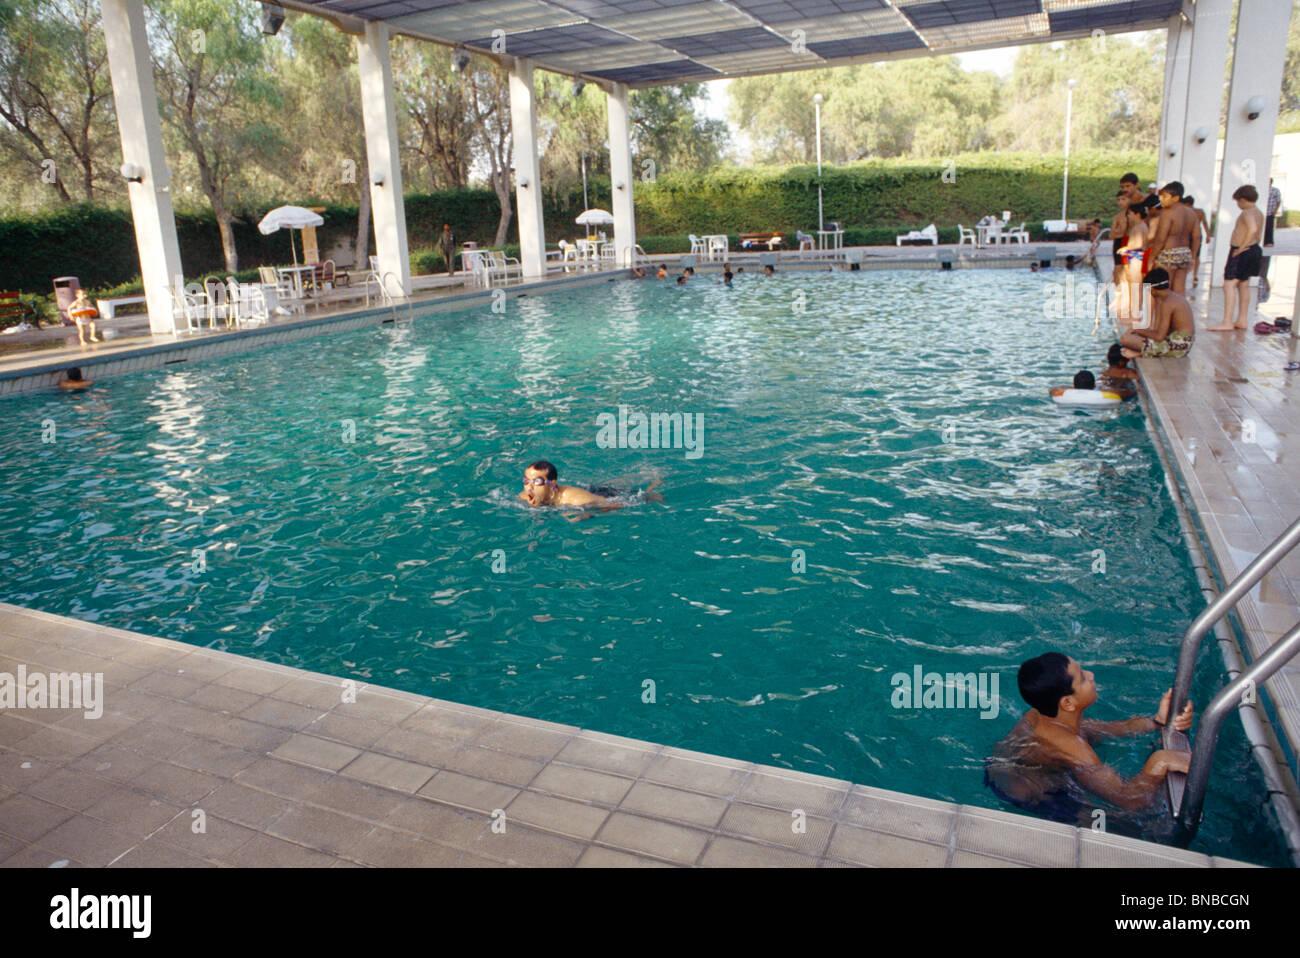 Dubai uae mushrif park teenager swimming in swimming pool - Dubai airport swimming pool price ...